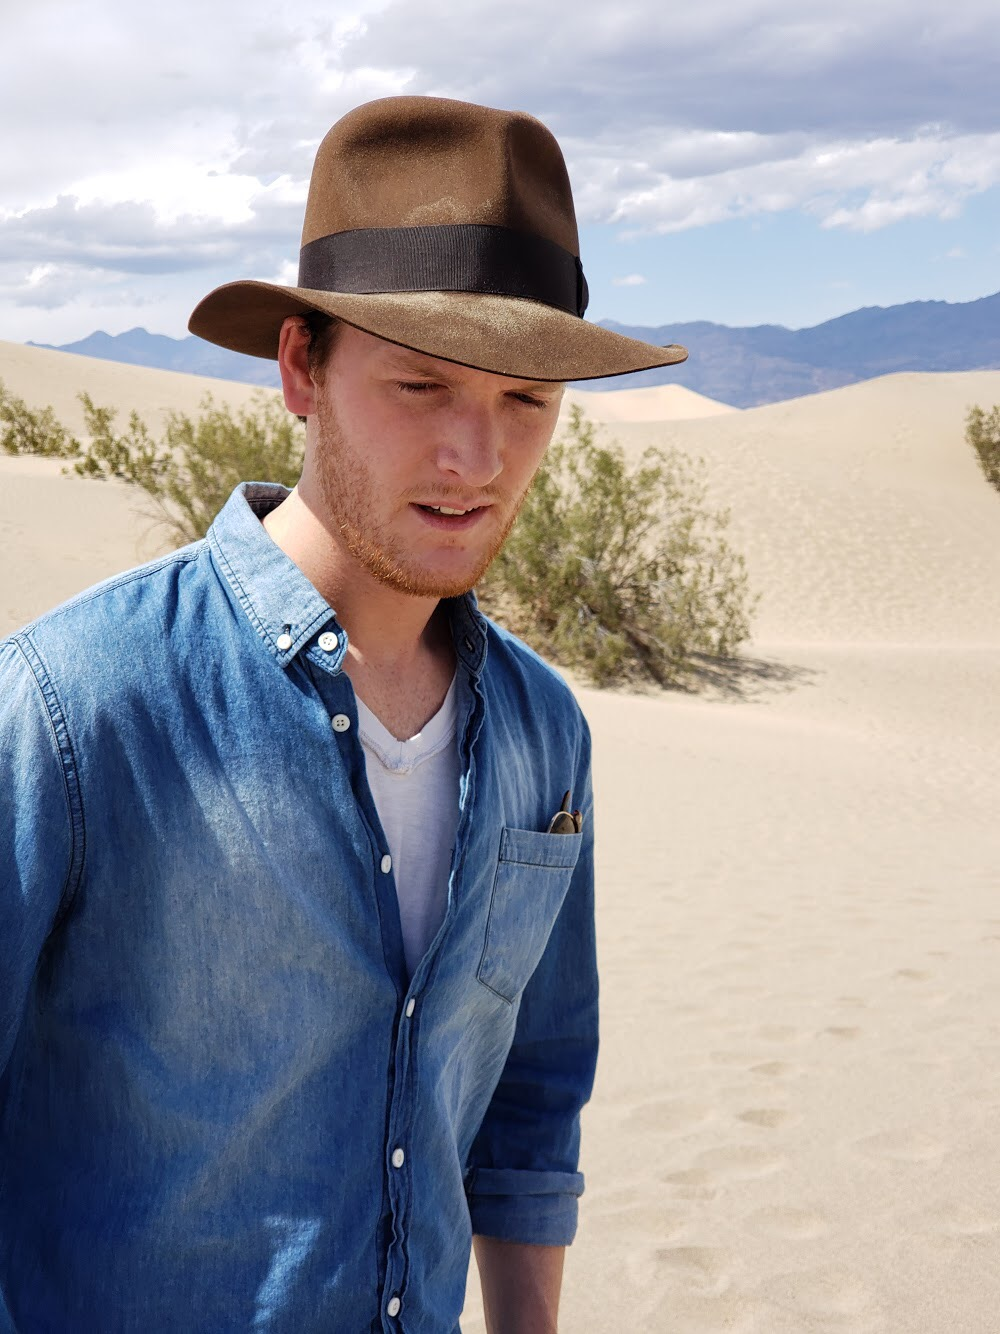 Alex - I really like my Indy hat! -